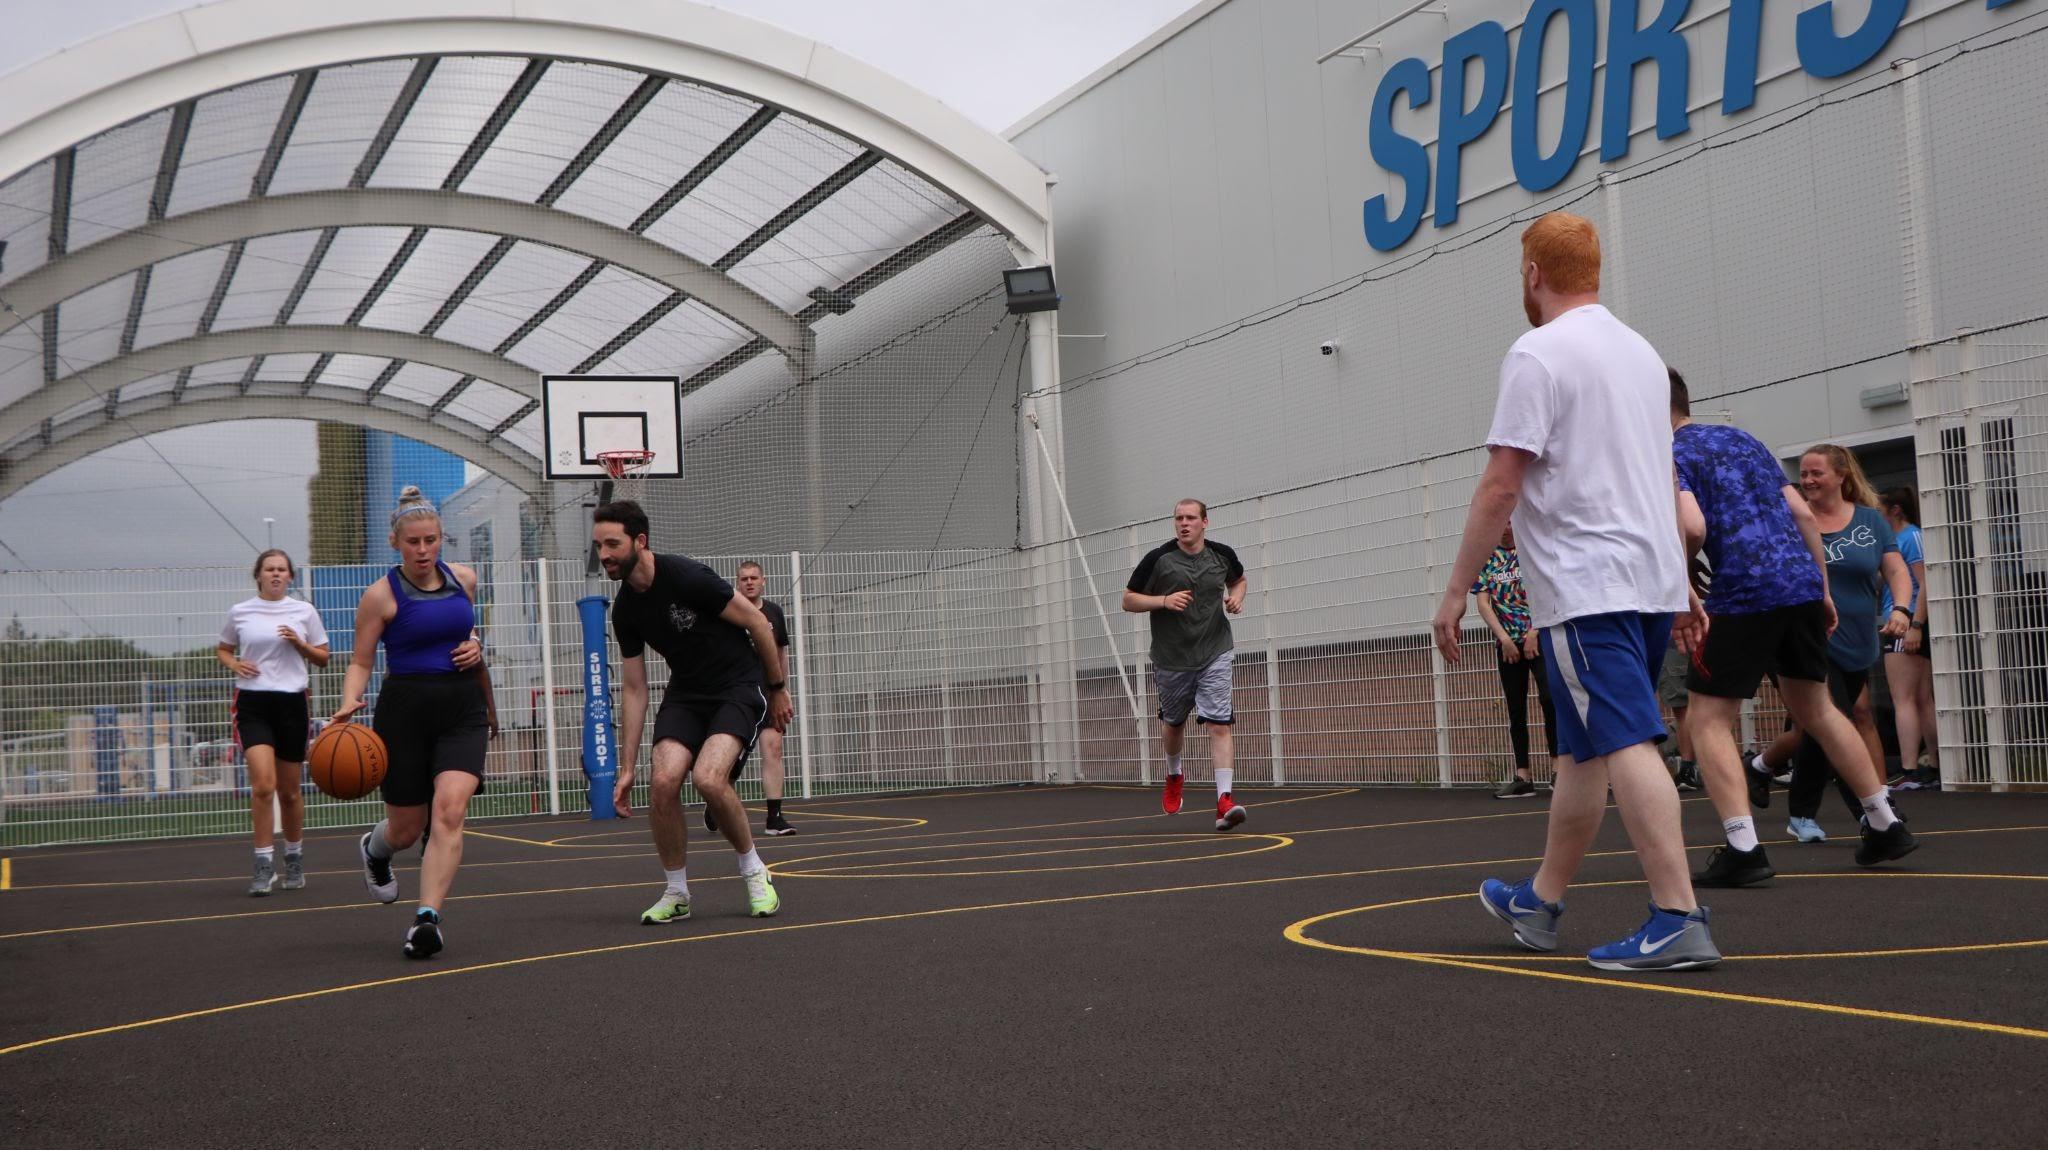 Basketball, Decathlon Ireland, Basketball hoops online